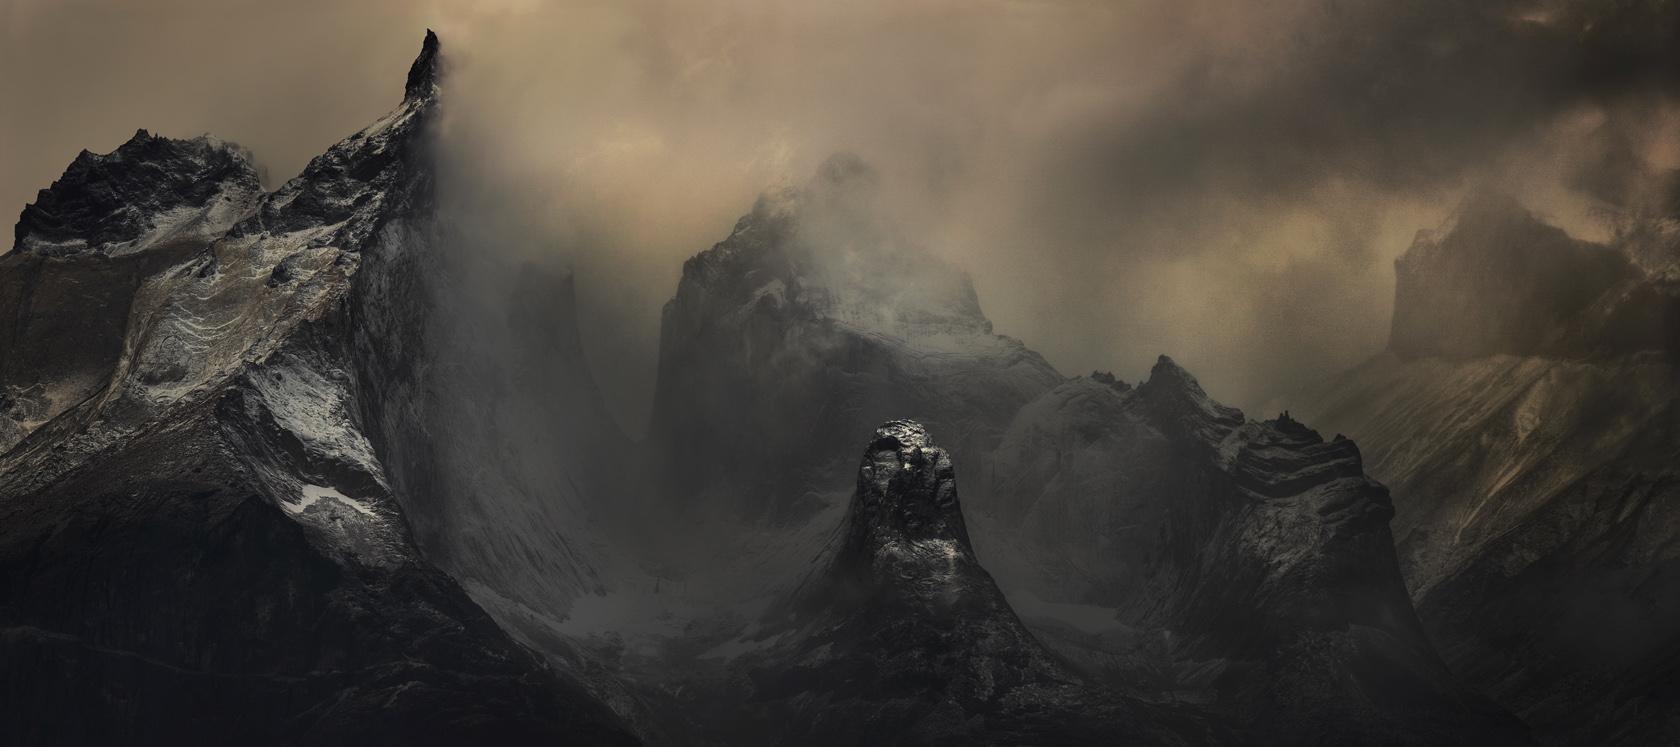 Les Montagnes Hallucinees